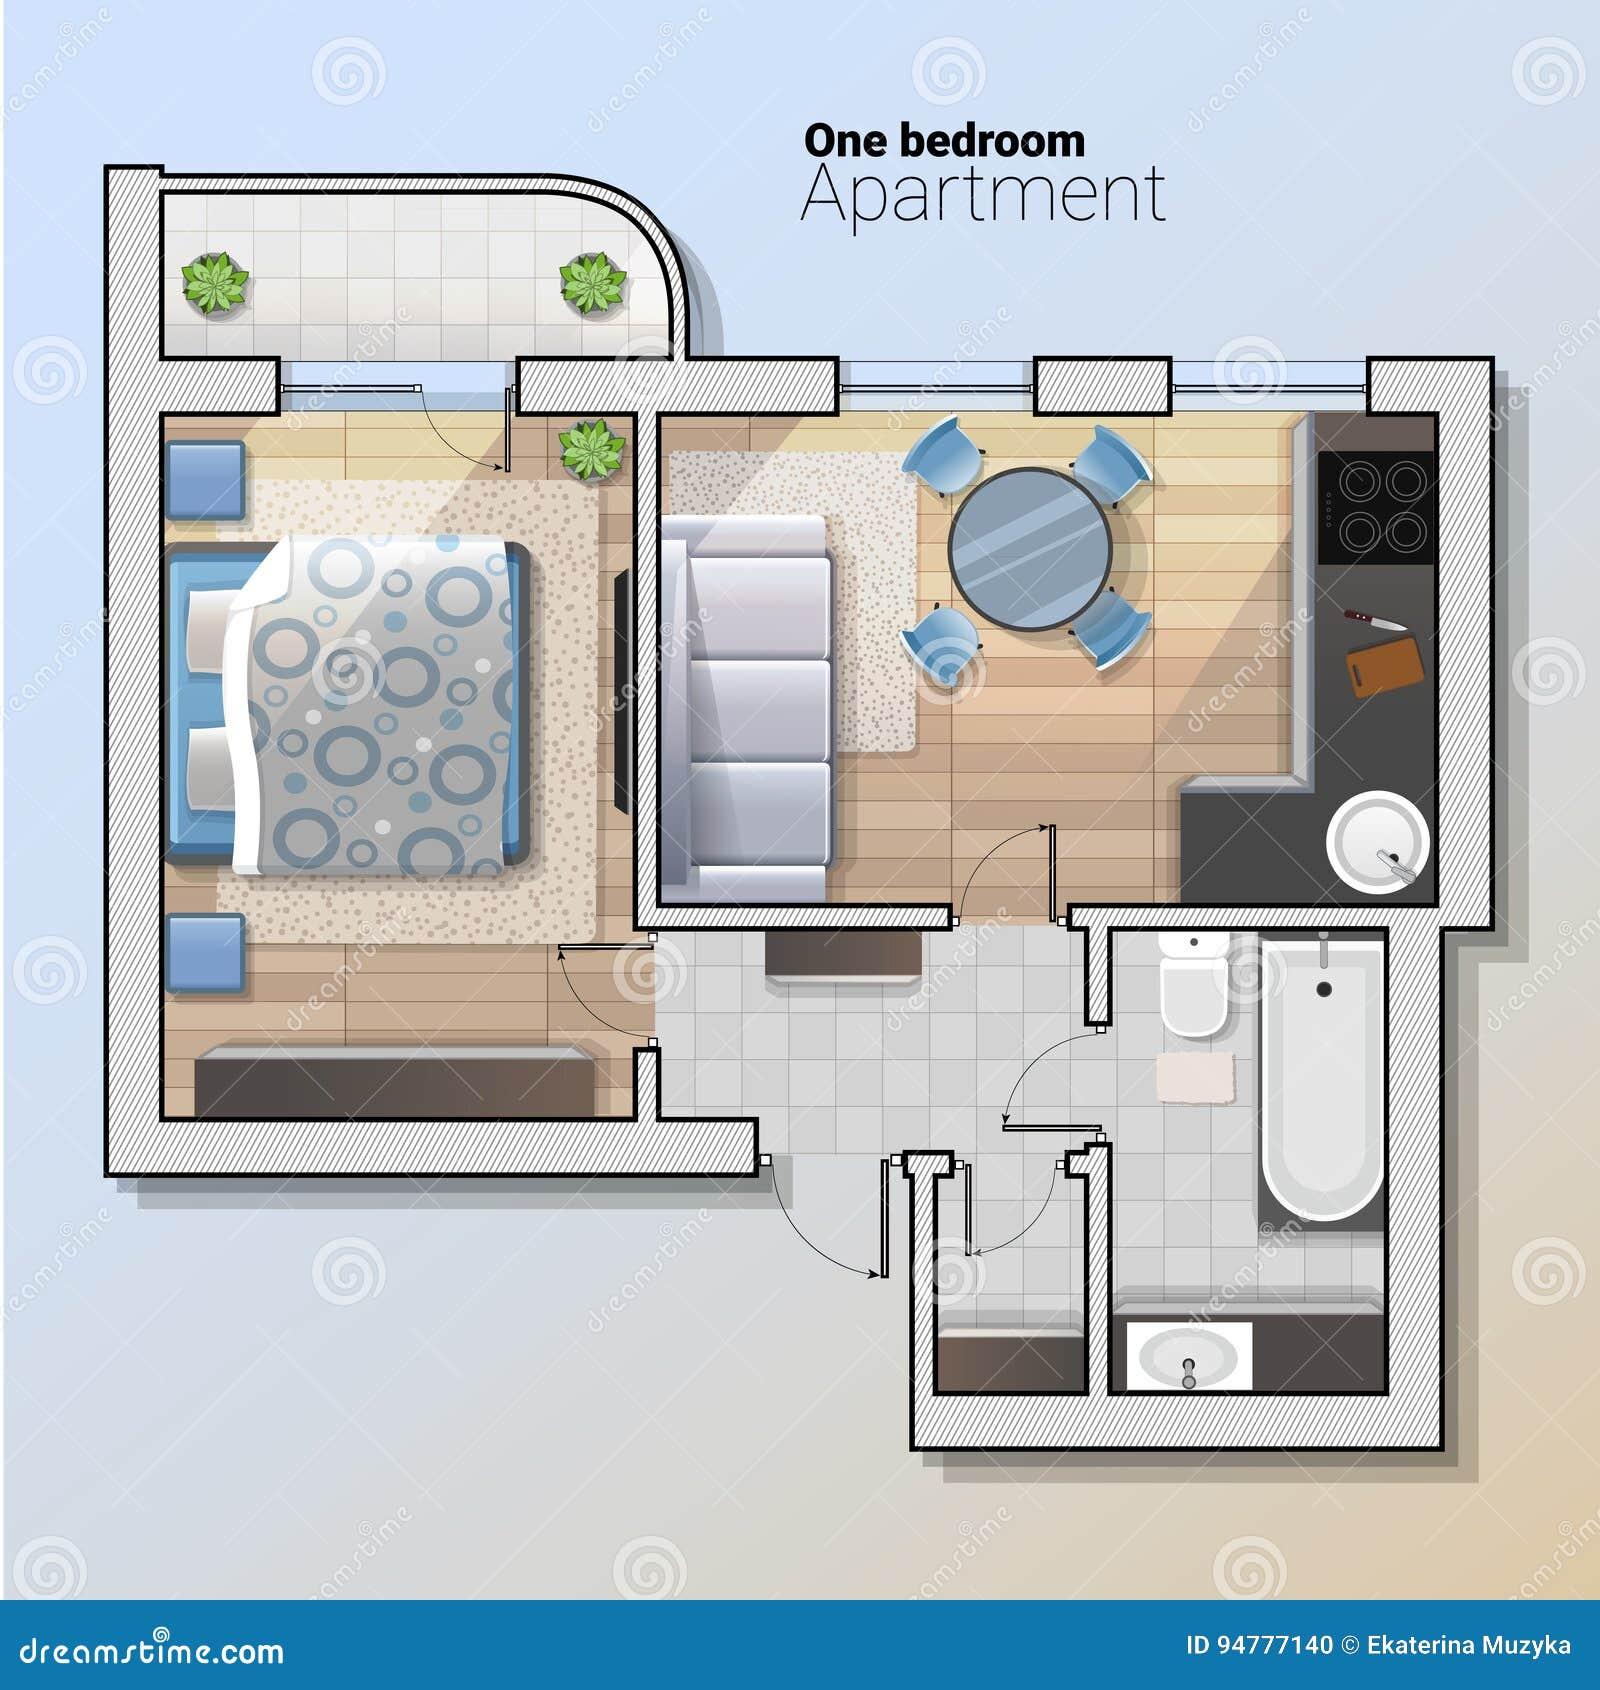 Modern 1 Bedroom Apartment: Vector Top View Illustration Of Modern One Bedroom